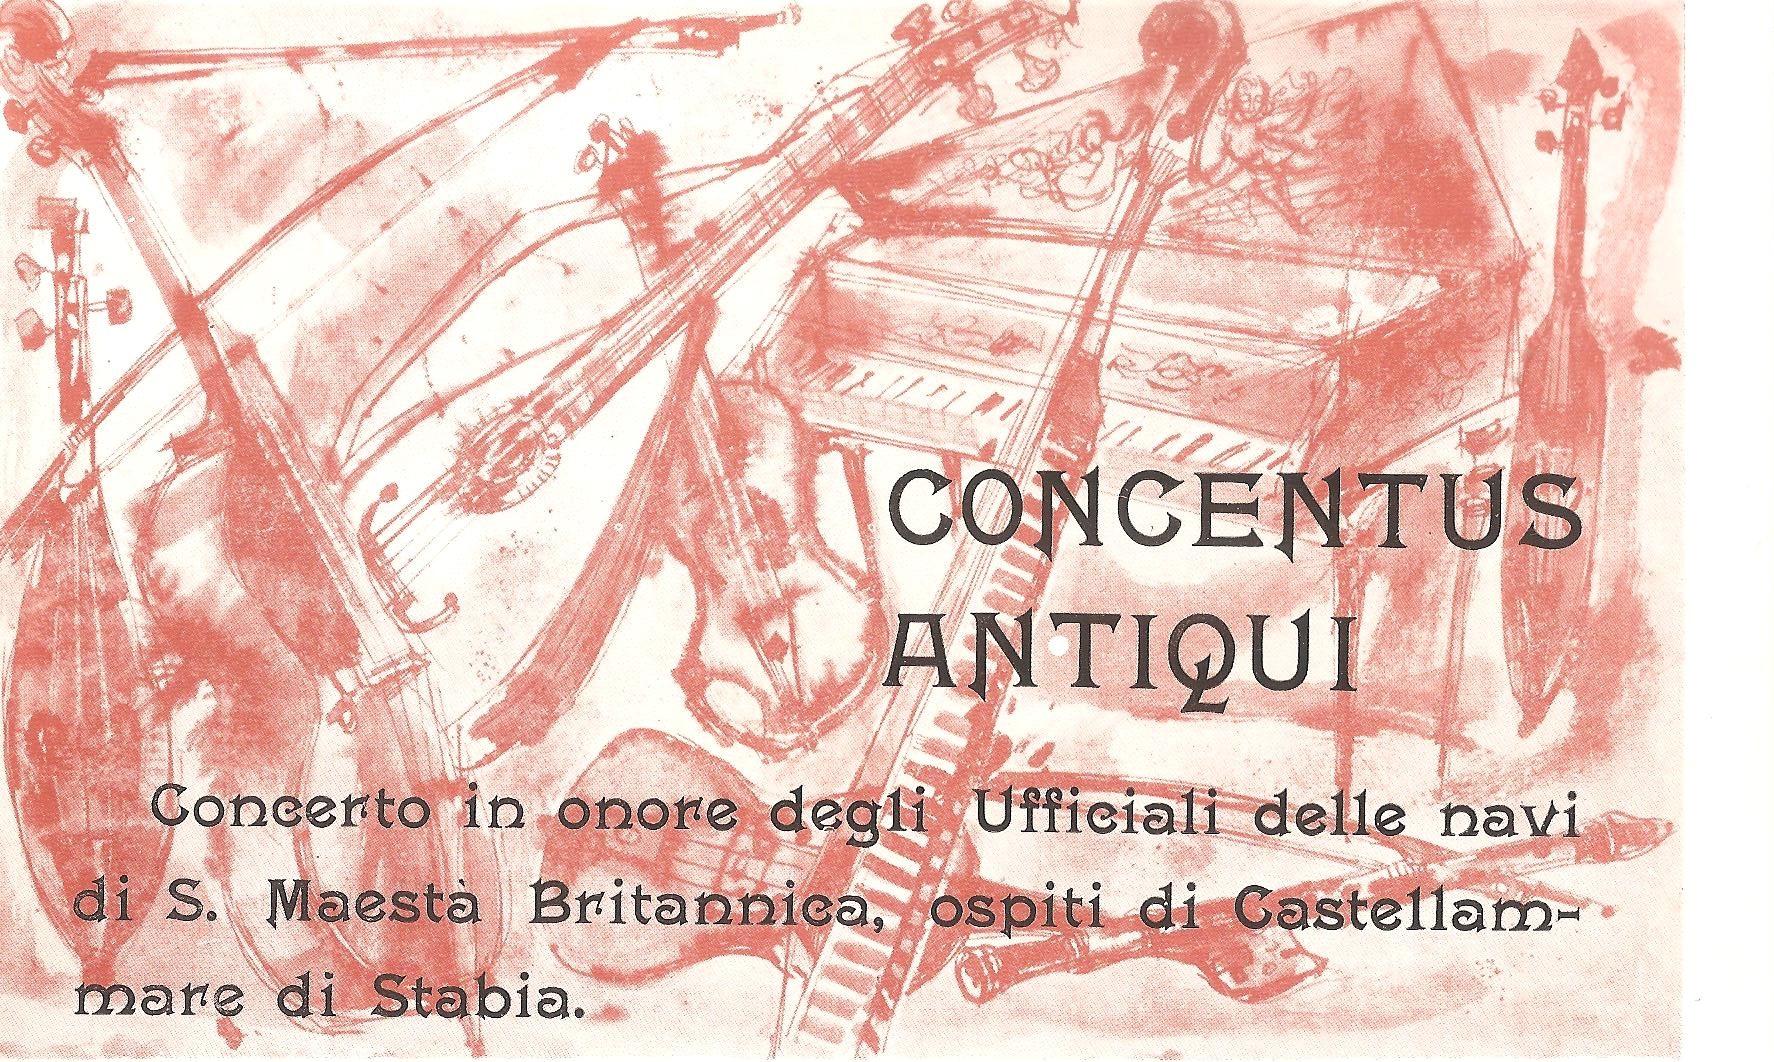 Concerto antico (marzo 1968)